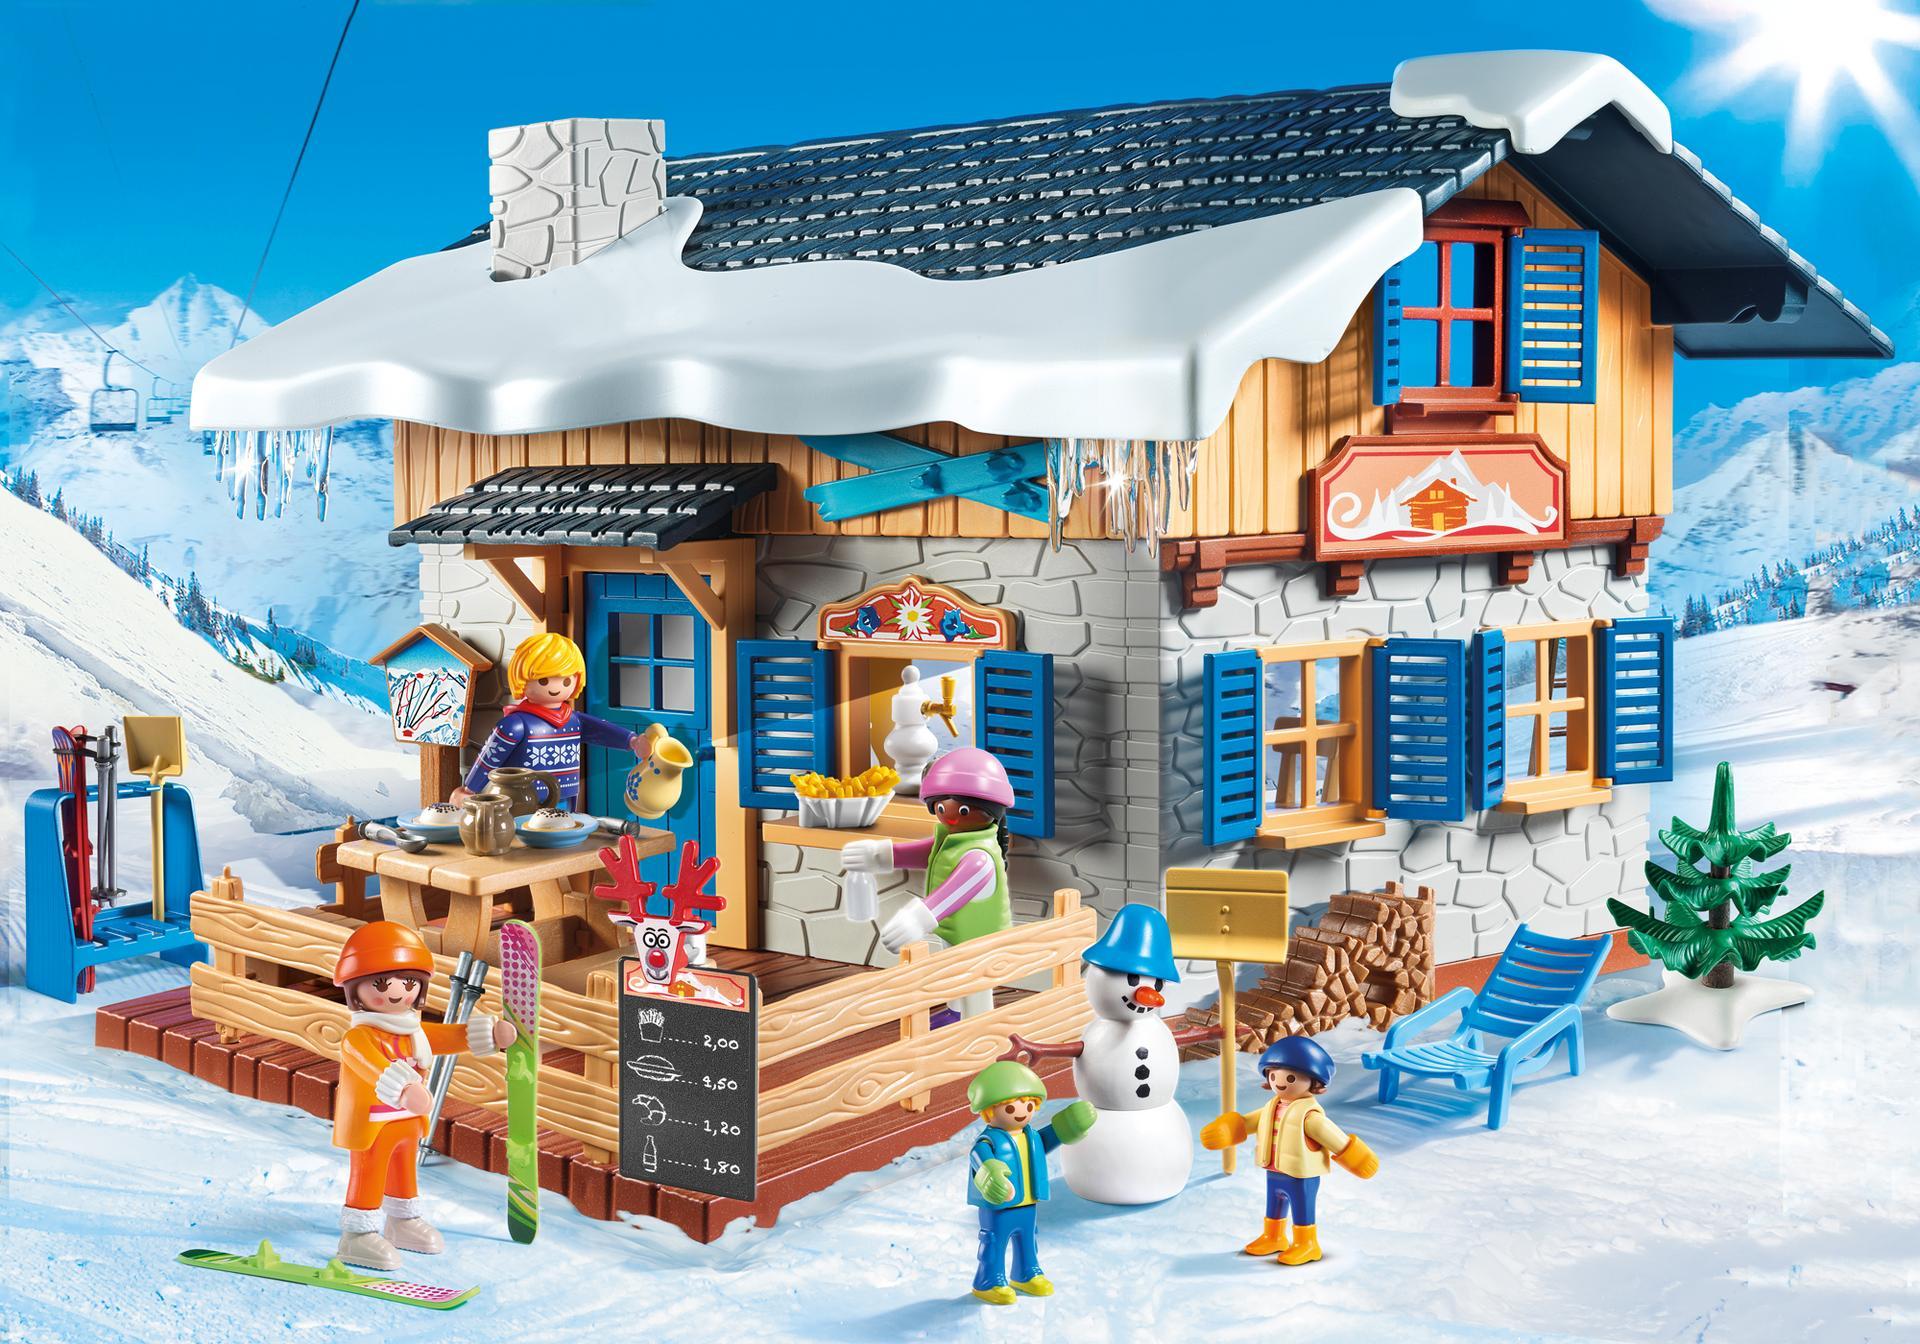 Playmobil Haus Ausmalbilder : Wunderbar Playmobil Aquapark Ausmalbilder Galerie Malvorlagen Von